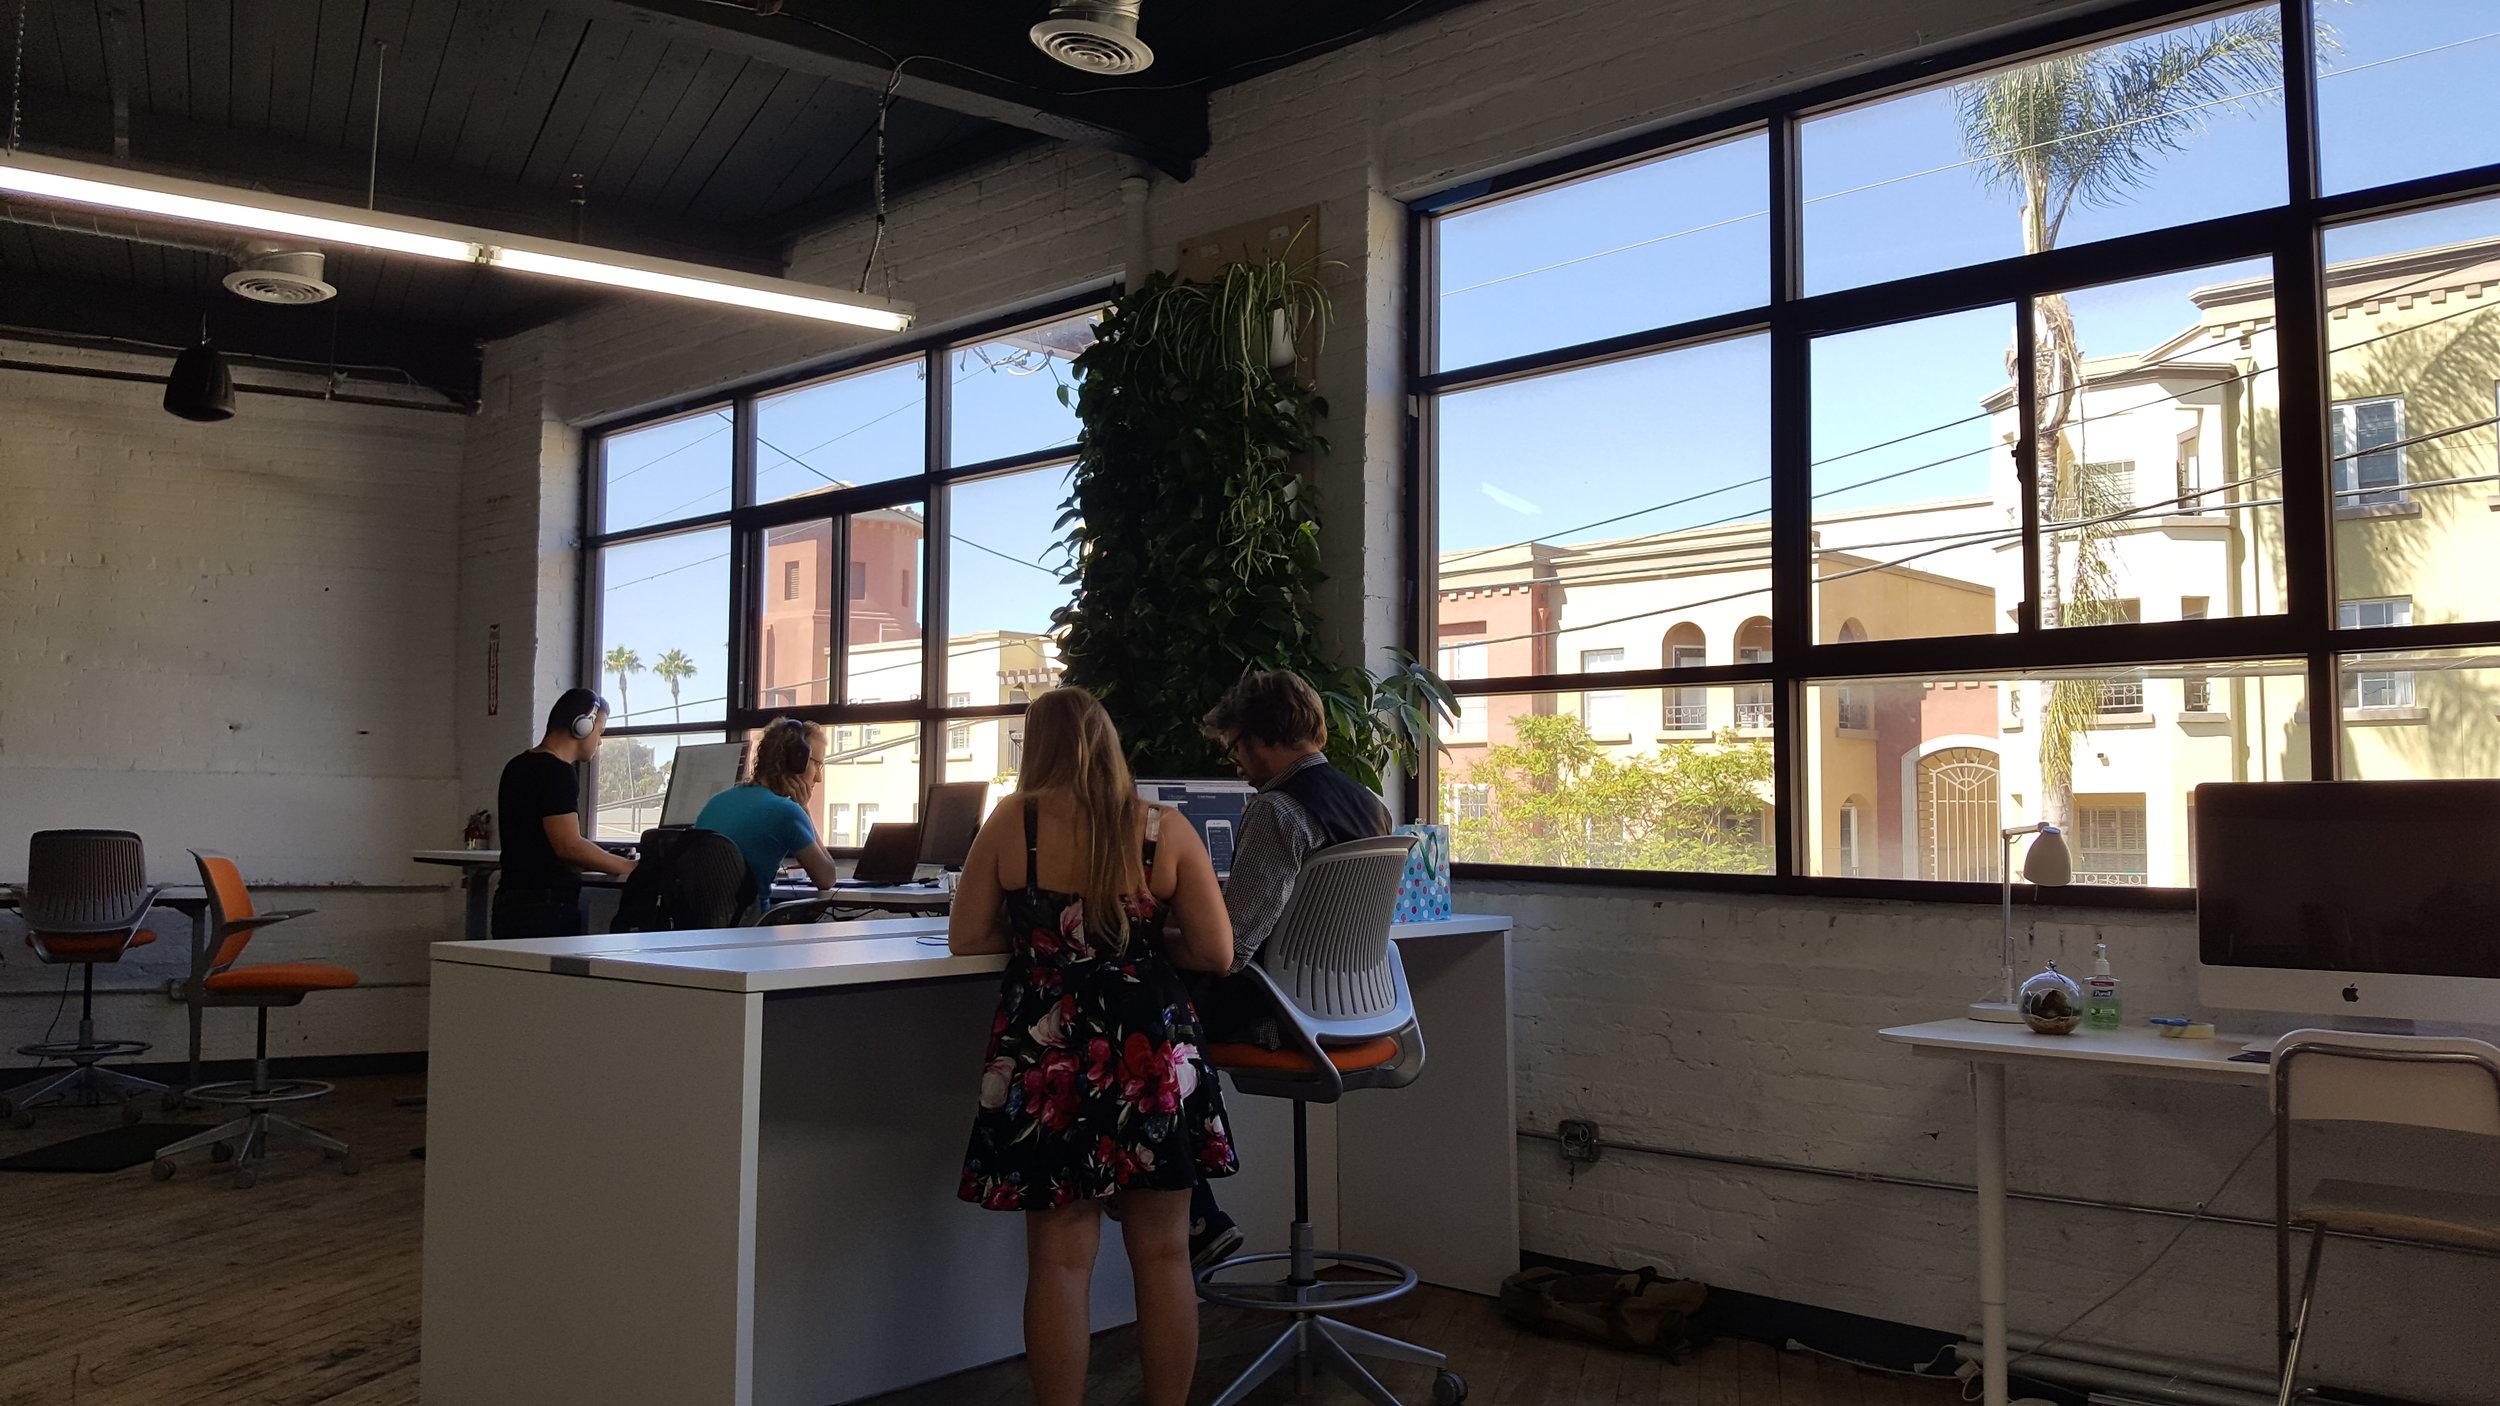 Stand-up desks and neighborhood views are an option.